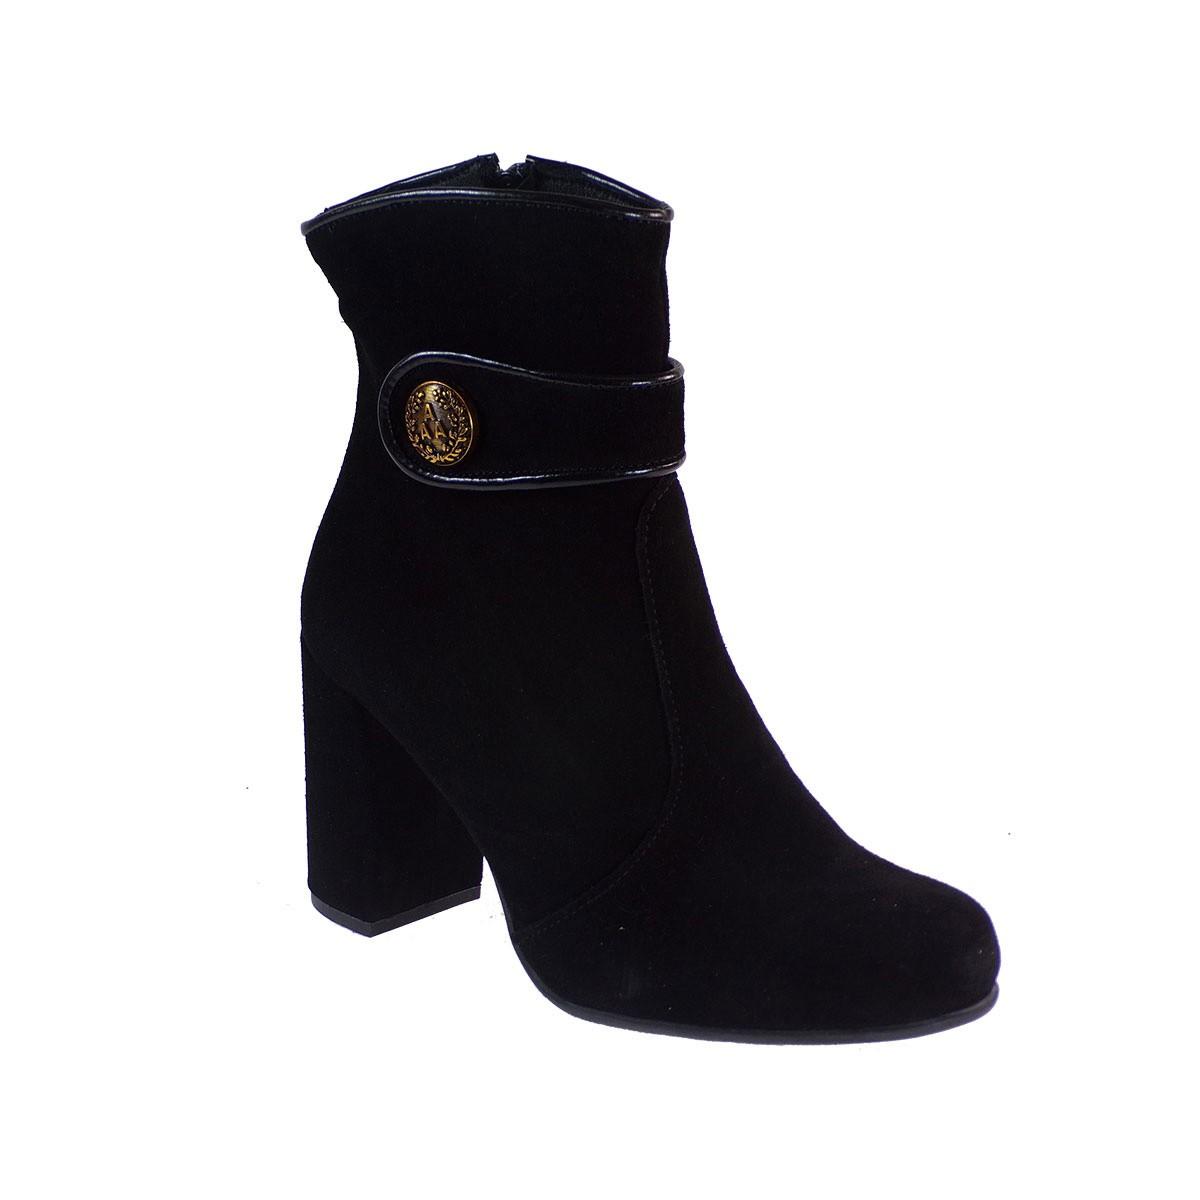 Smart Cronos Γυναικεία Παπούτσια Μποτάκια 7145-3738 Μαύρο Δέρμα Καστόρι